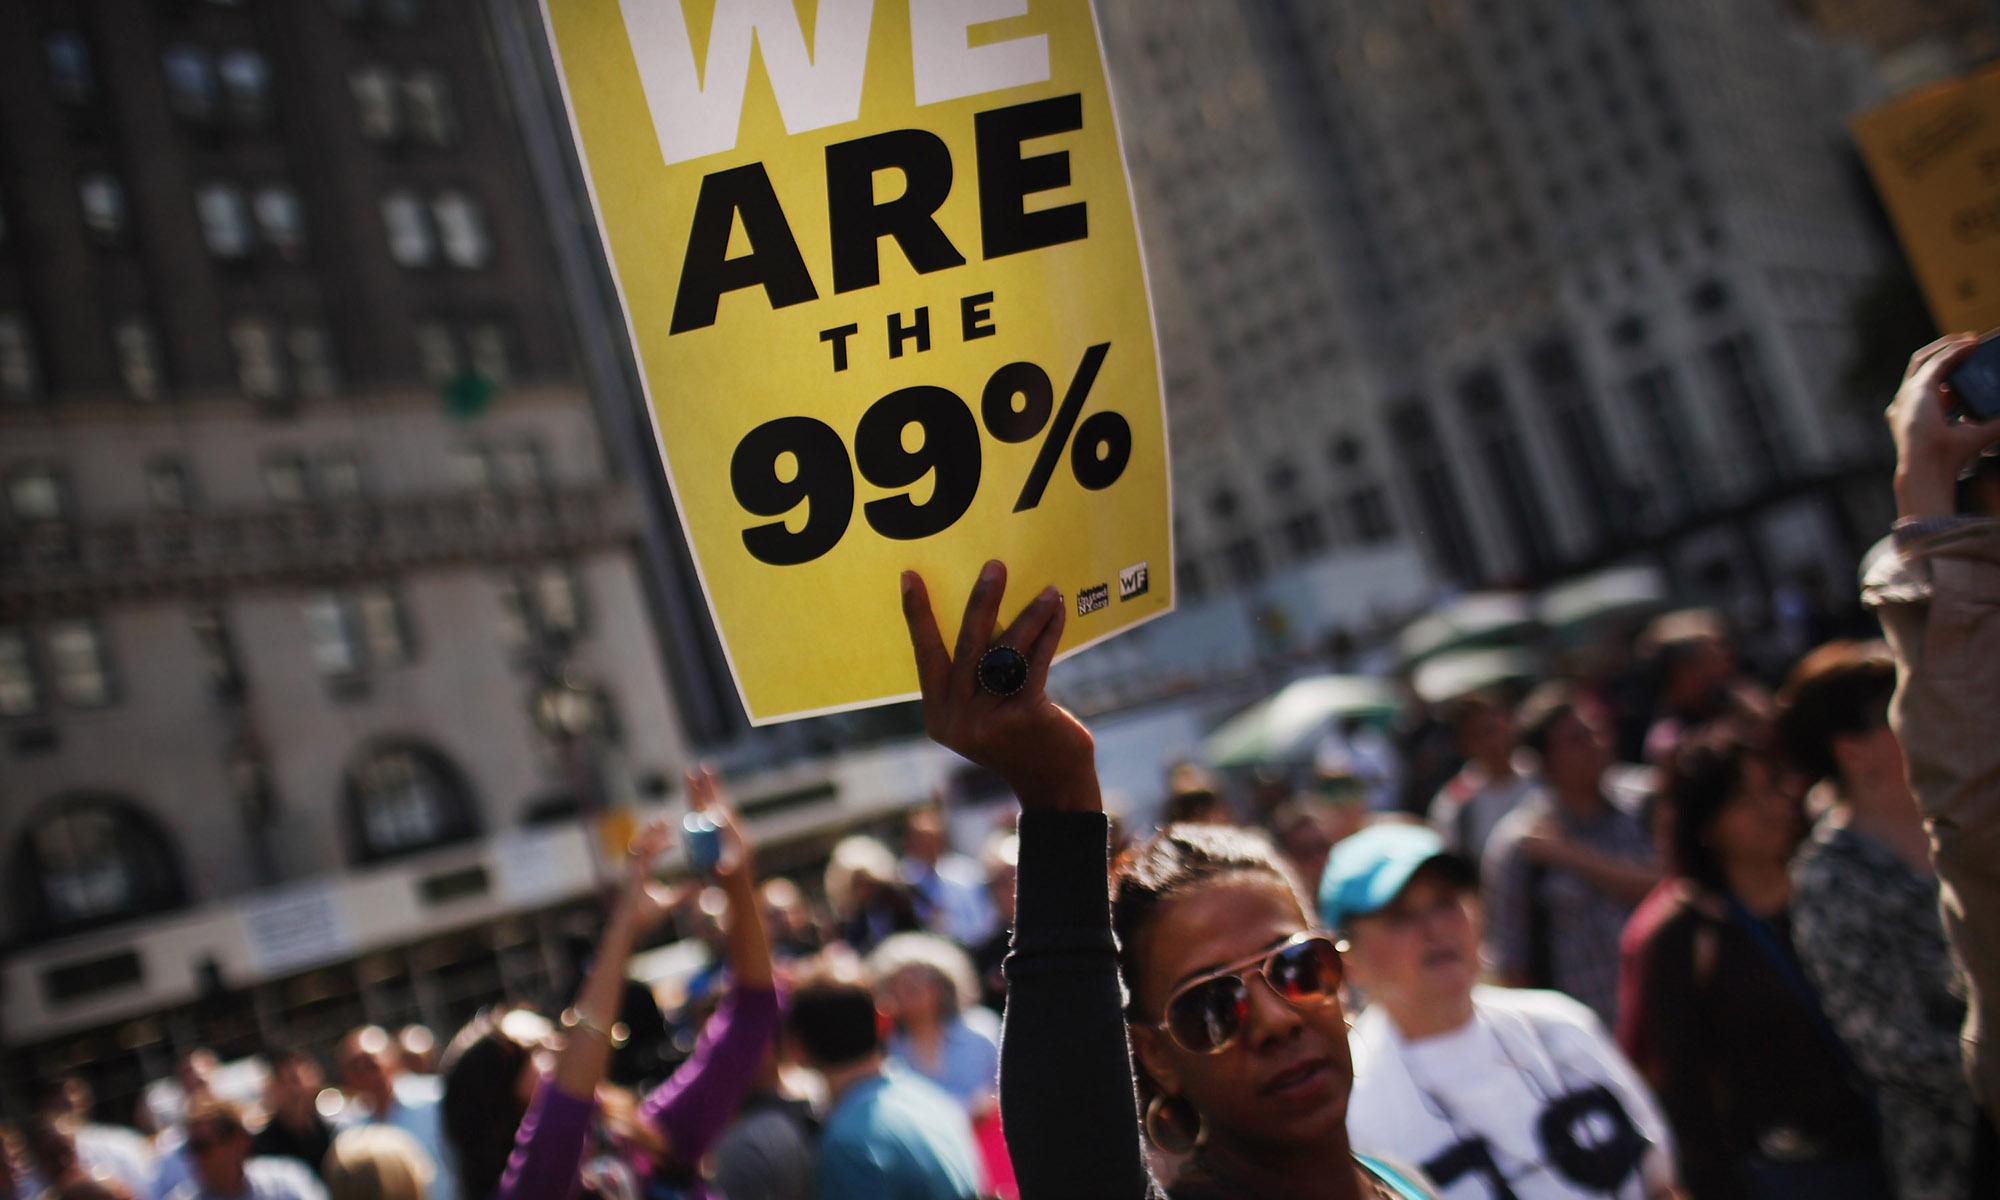 Disuguaglianze: chi rende i ricchi sempre più ricchi?